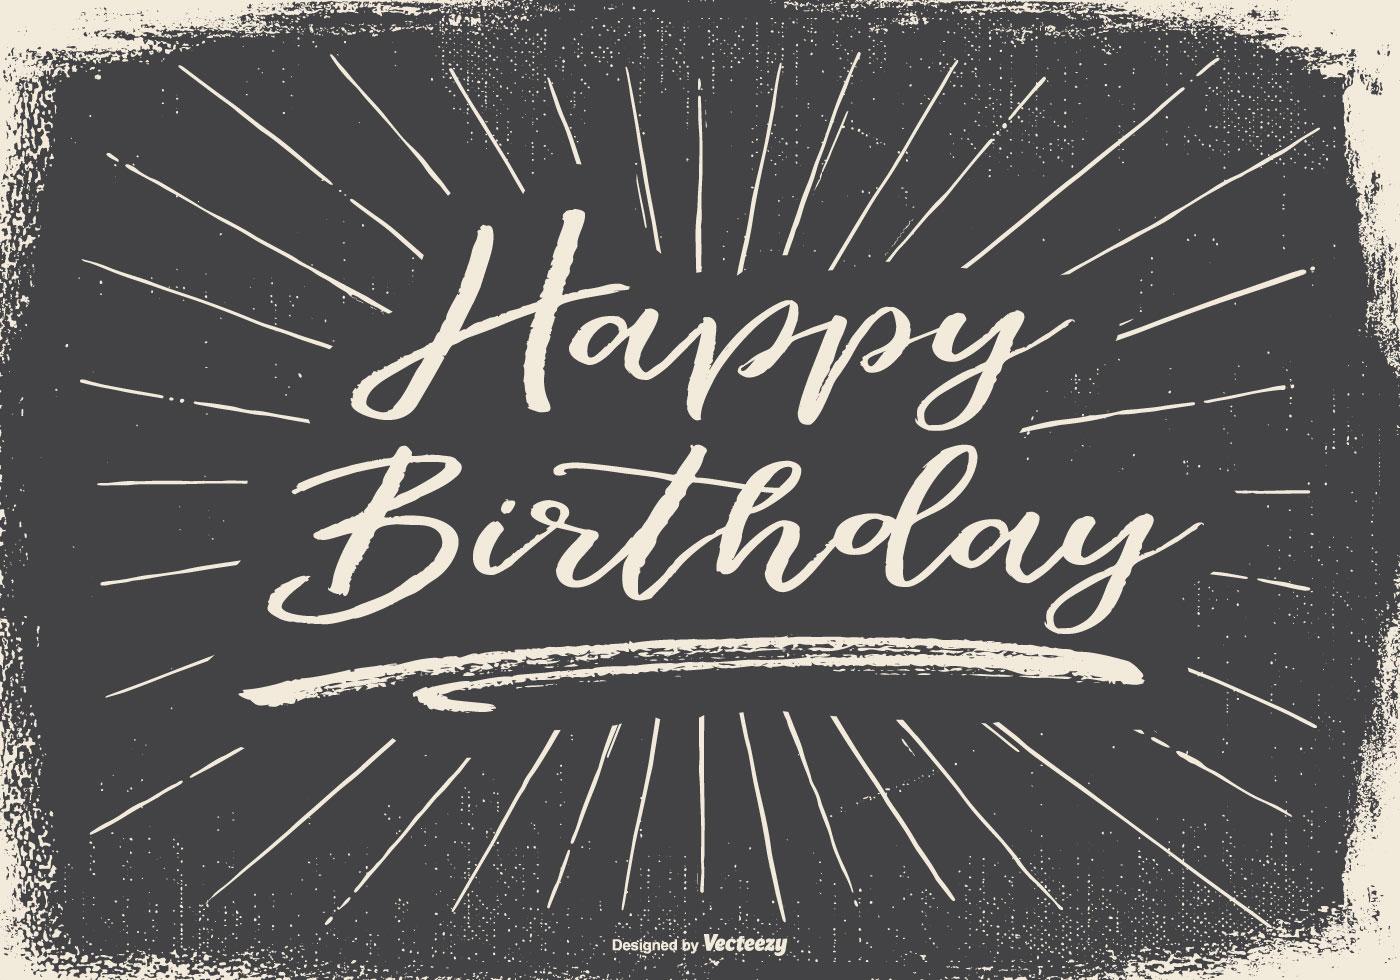 Hand Drawn Candy Set Vector Illustration Auto Electrical Wiring Kohler 4cm21 Generator Diagram Vintage Typographic Happy Birthday